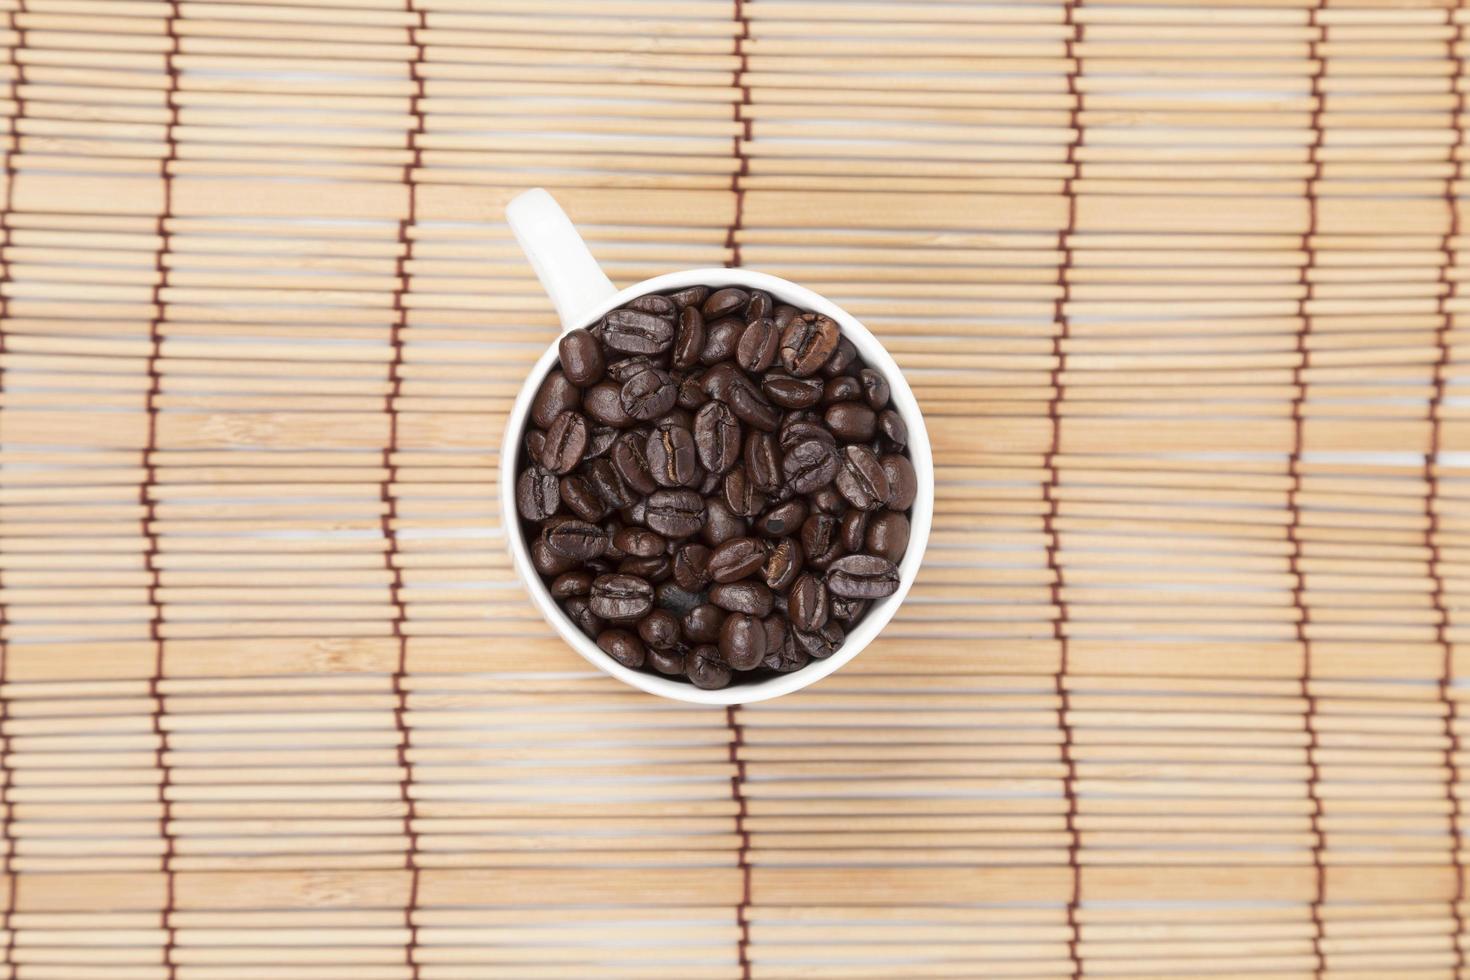 taza de café en la mesa foto